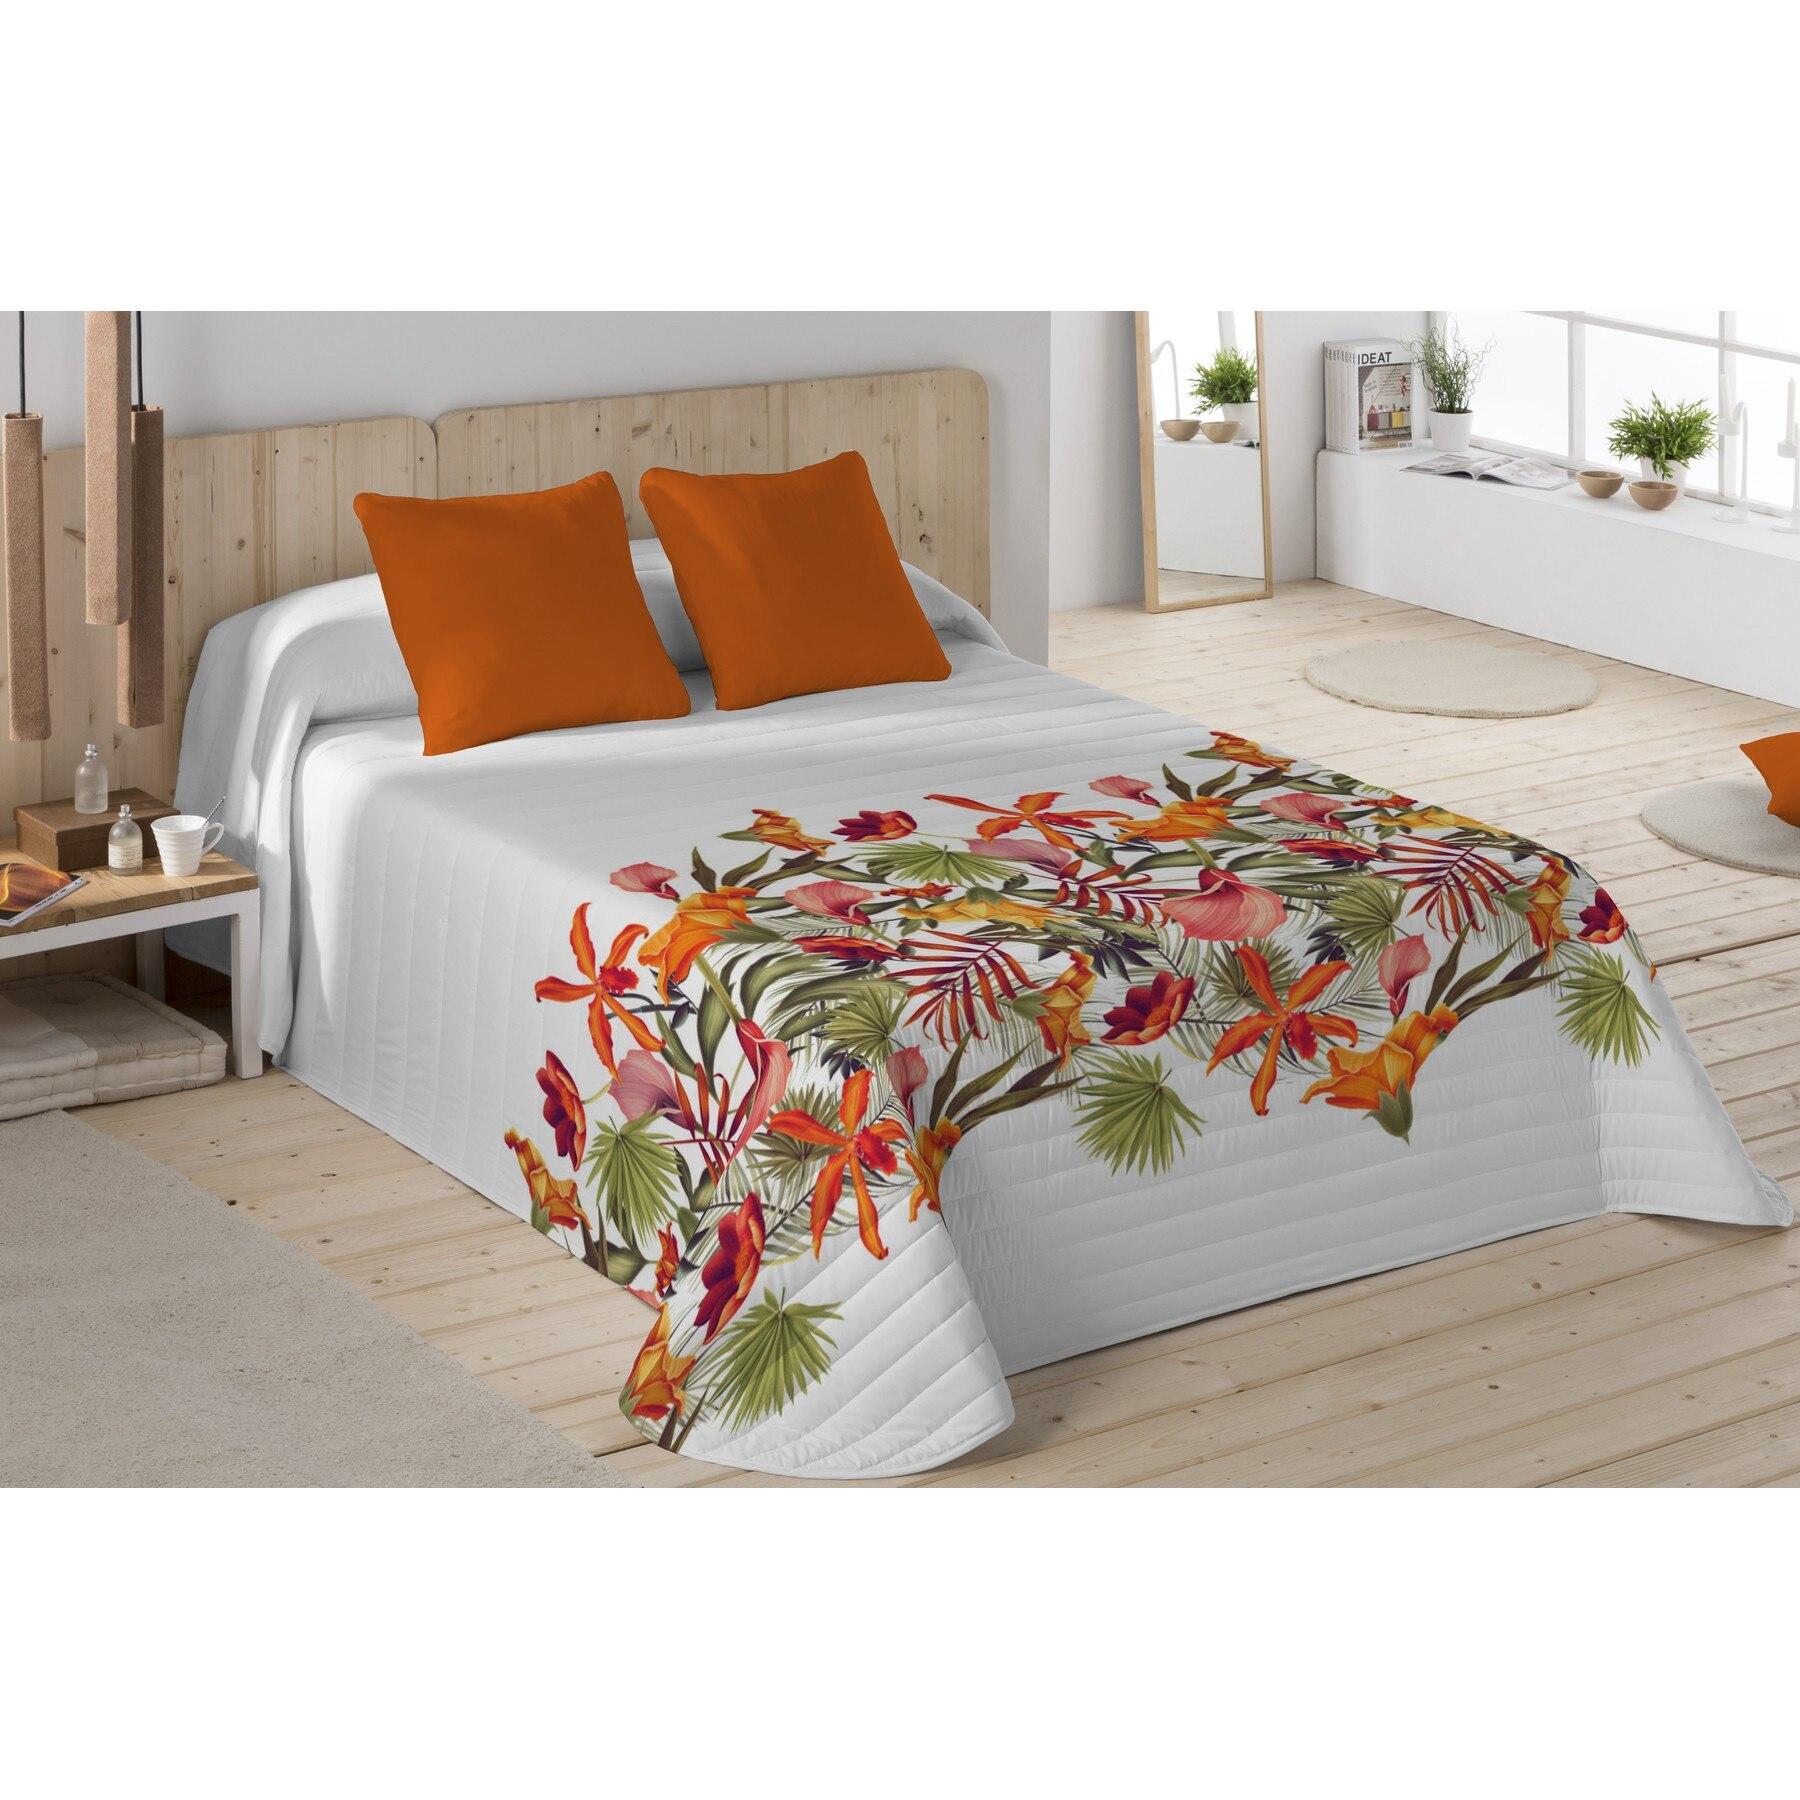 Bedspread BOUTY NARCISA